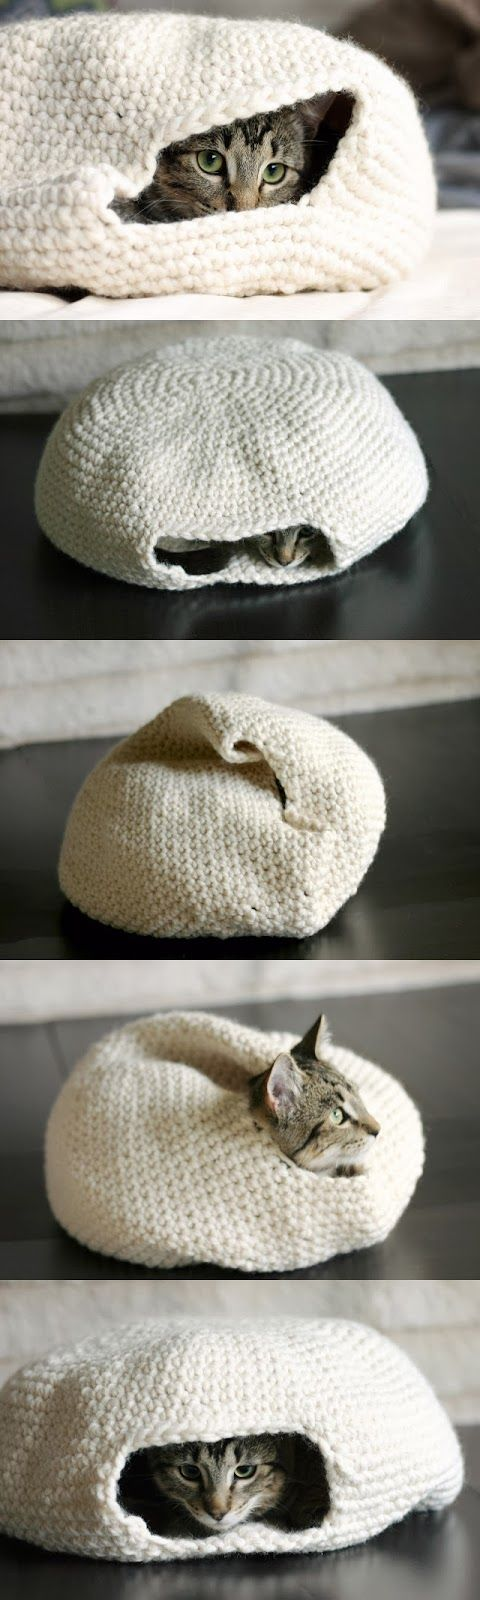 25+ best ideas about Crochet cats on Pinterest Crochet cat pattern, Crochet...